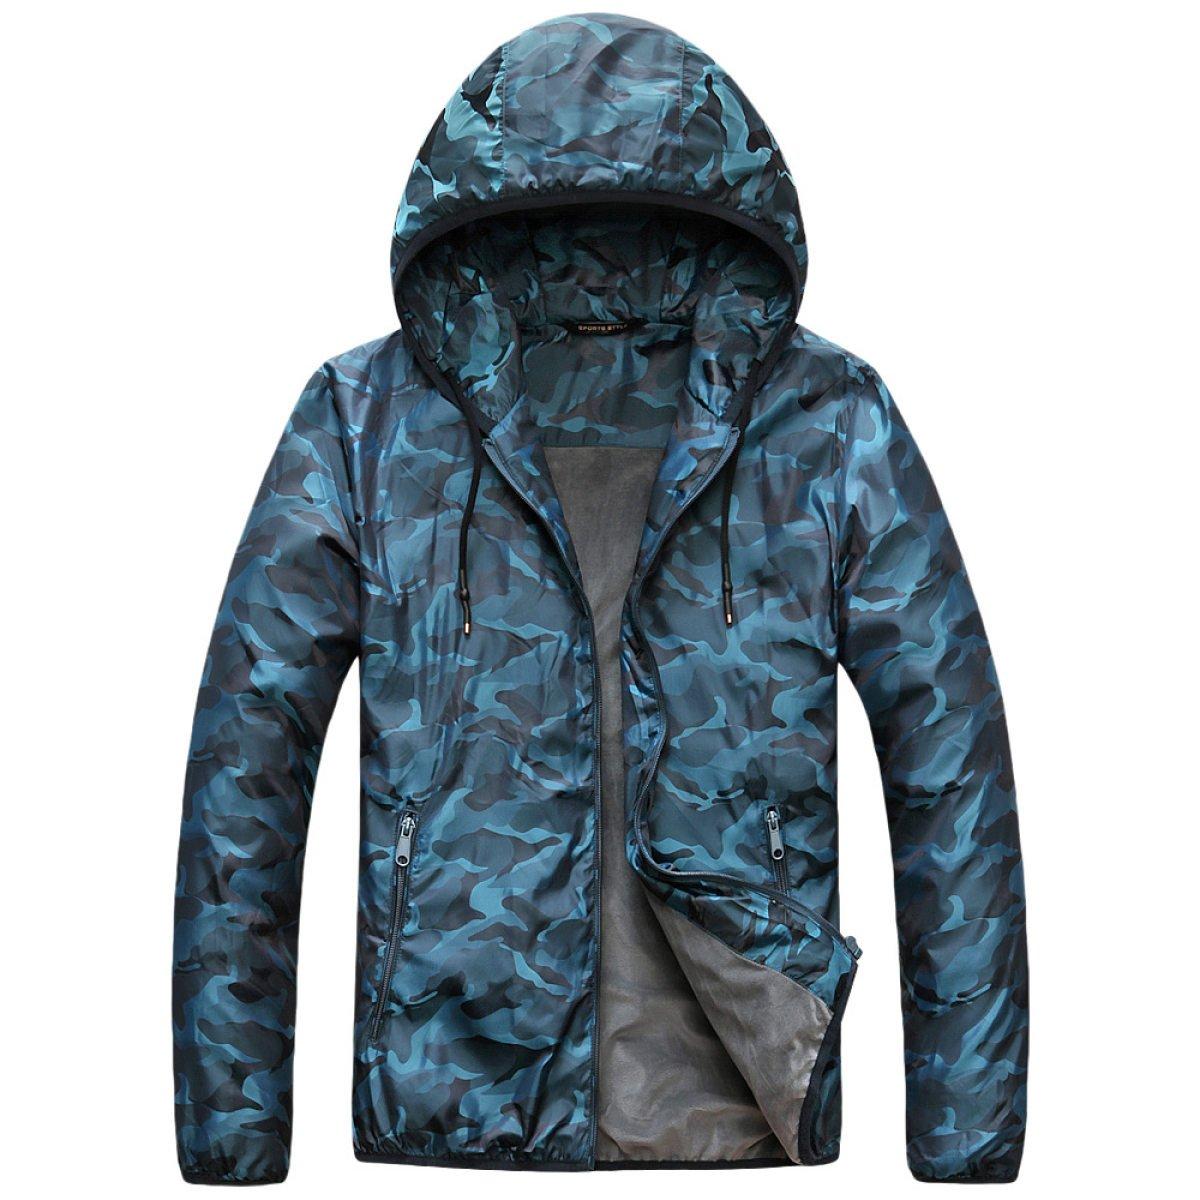 Shuang Yu Zuo Männlich Herbst Mantel Paar Modelle Haube Wind Sonne Atmungsaktiv Warme Camouflage Outdoor